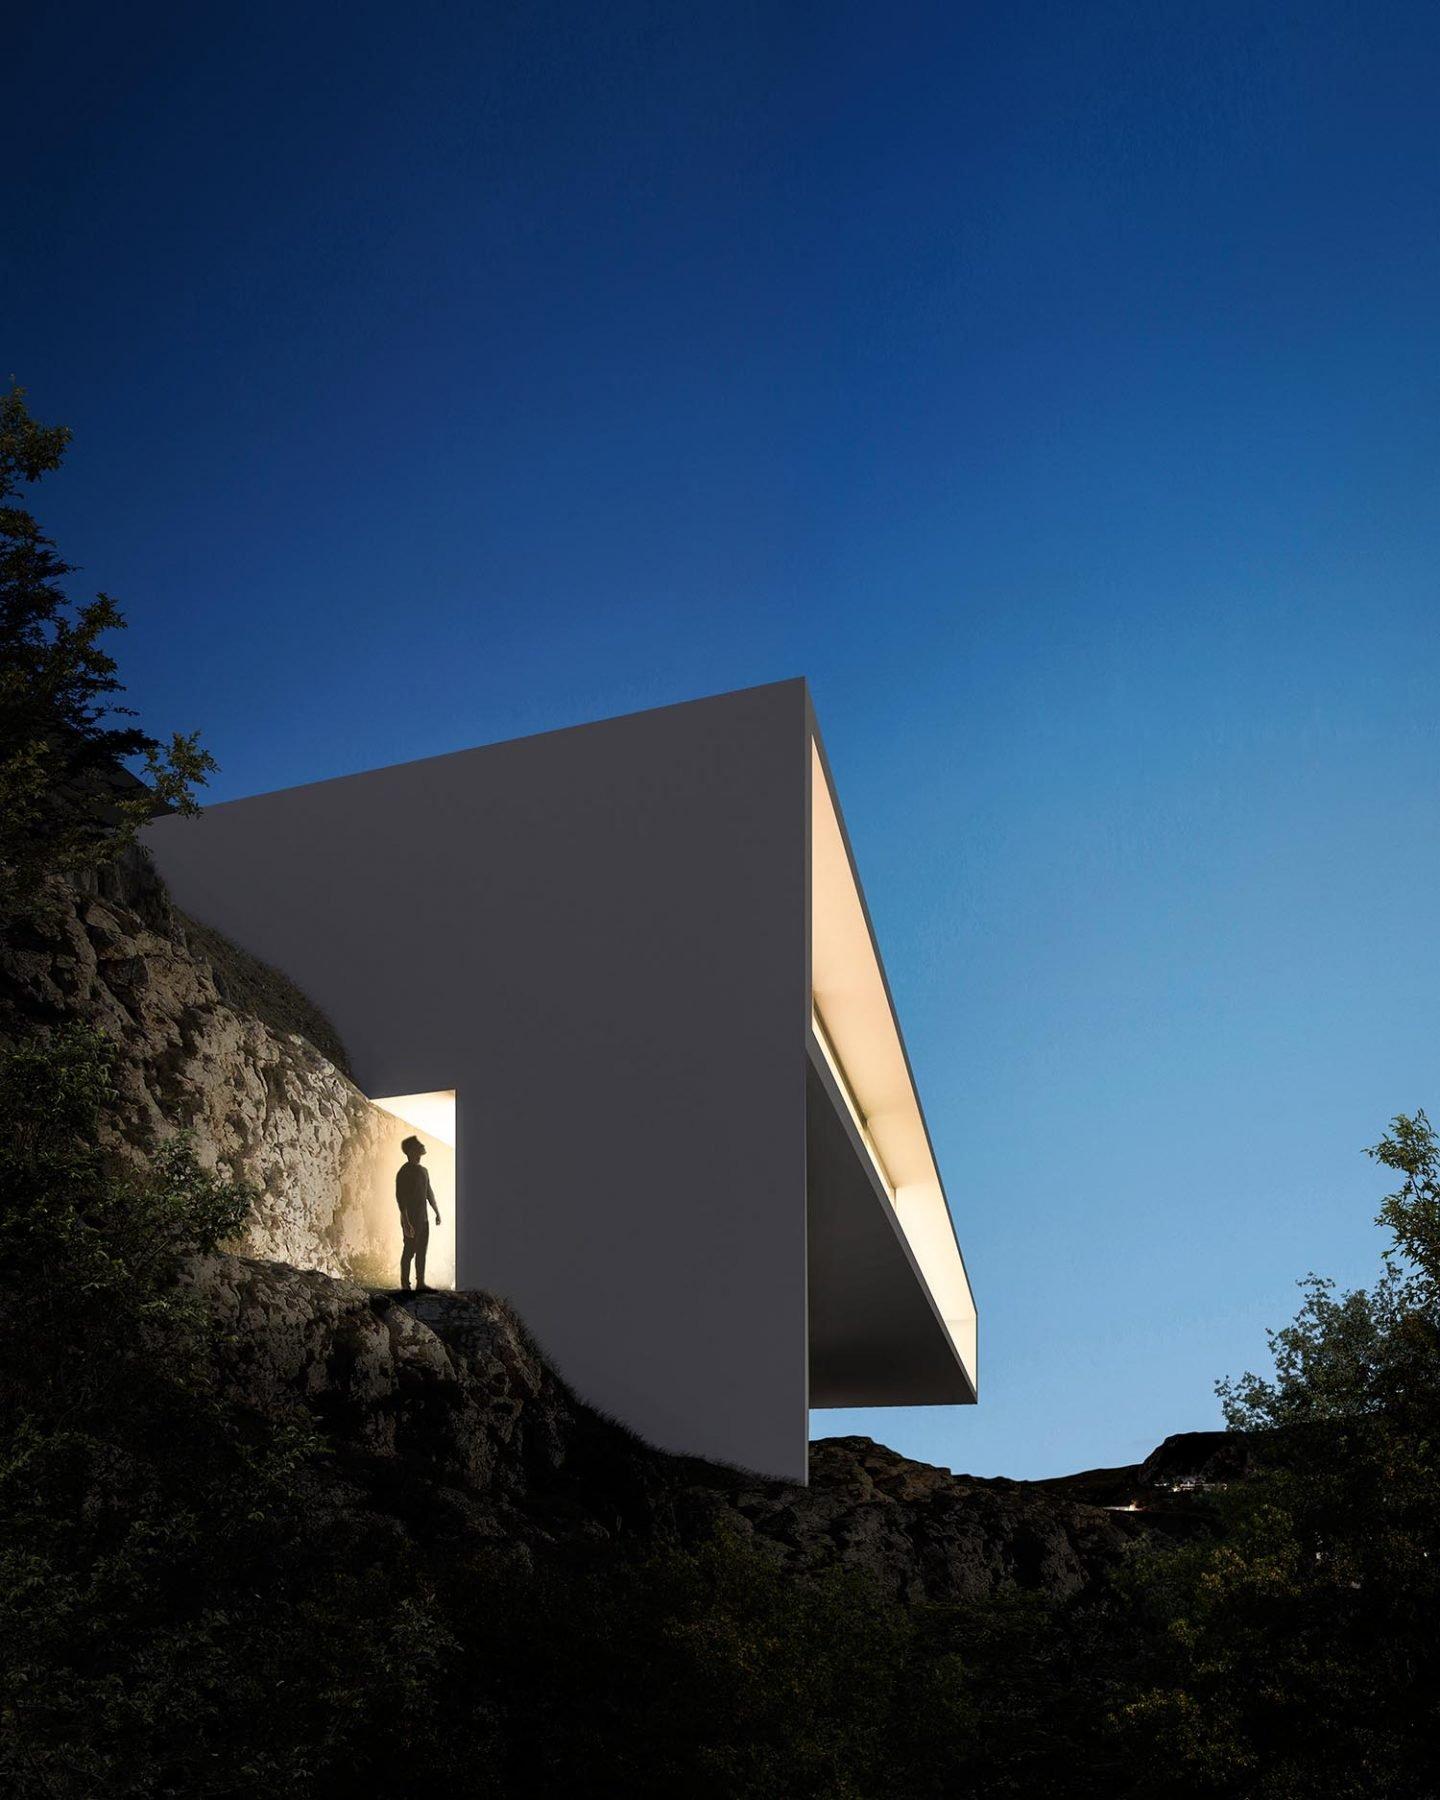 Architecture_MinimalHollywoodResidence_FranSilvestreArquitectos07